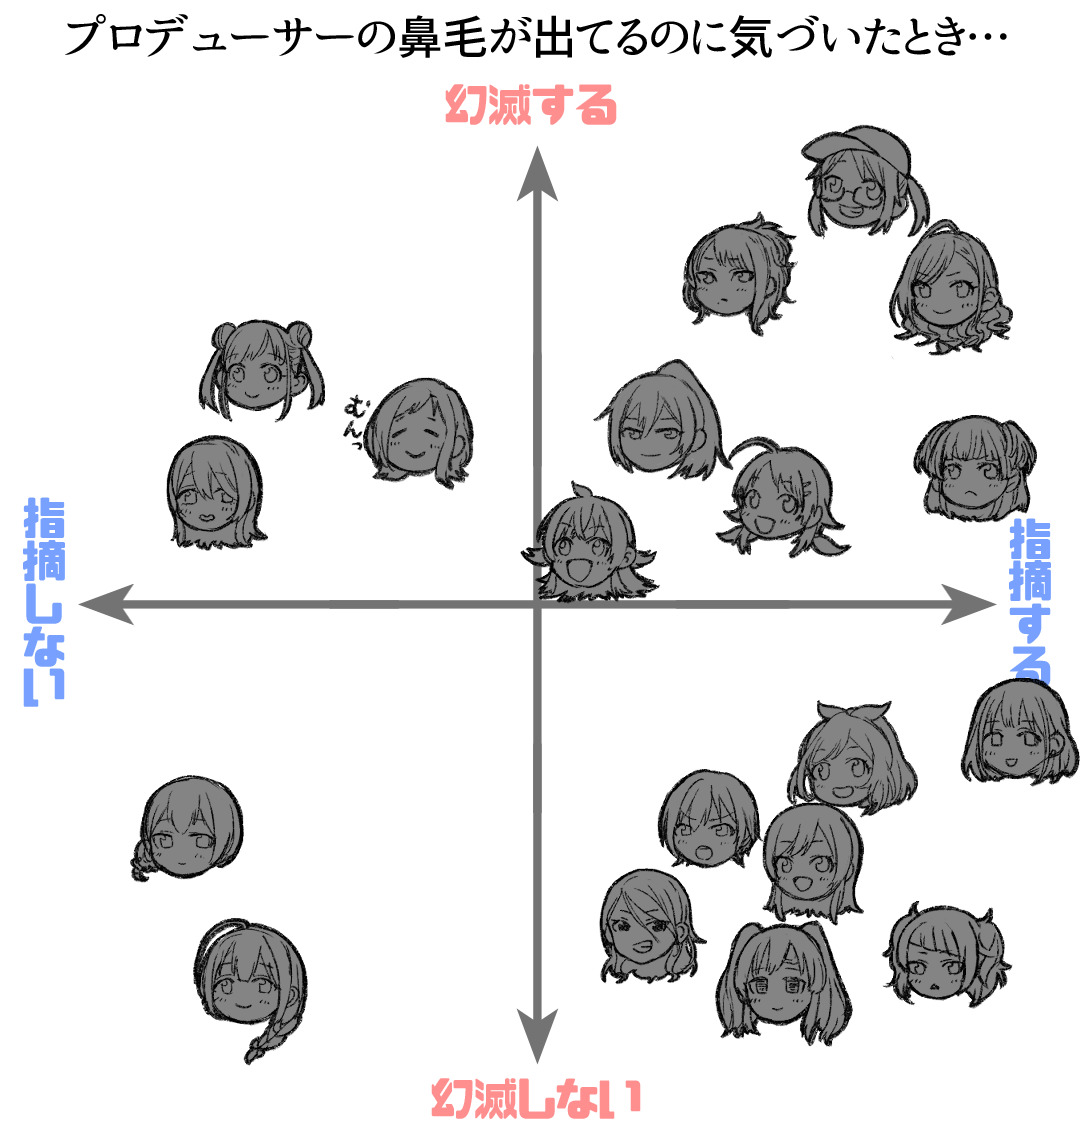 f:id:hoshi_sano:20200414110647j:image:w400